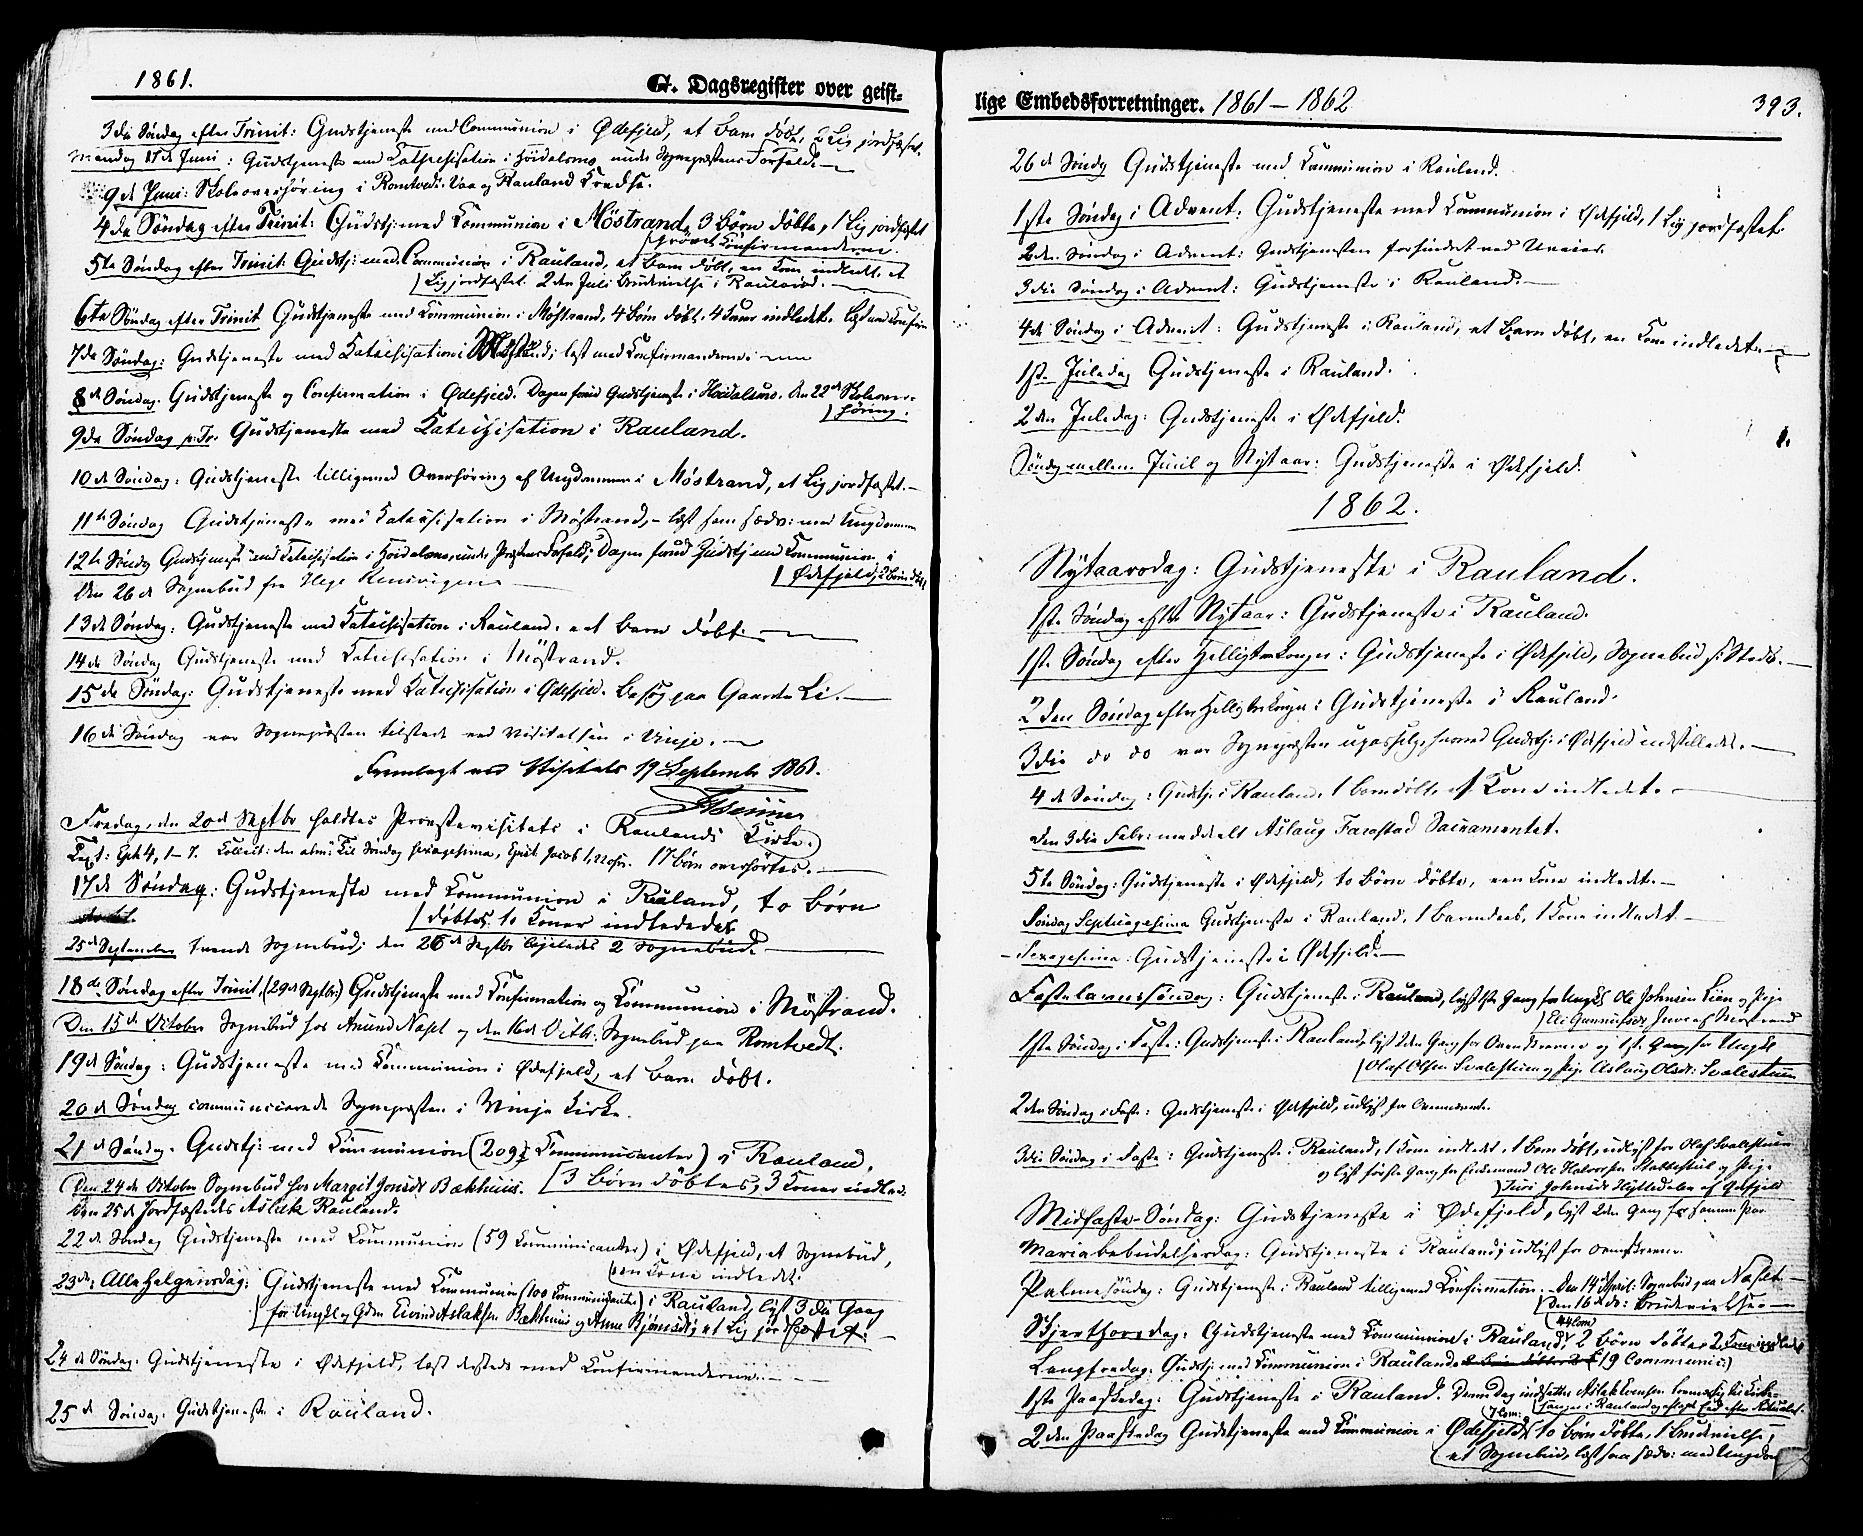 SAKO, Rauland kirkebøker, F/Fa/L0003: Ministerialbok nr. 3, 1859-1886, s. 393